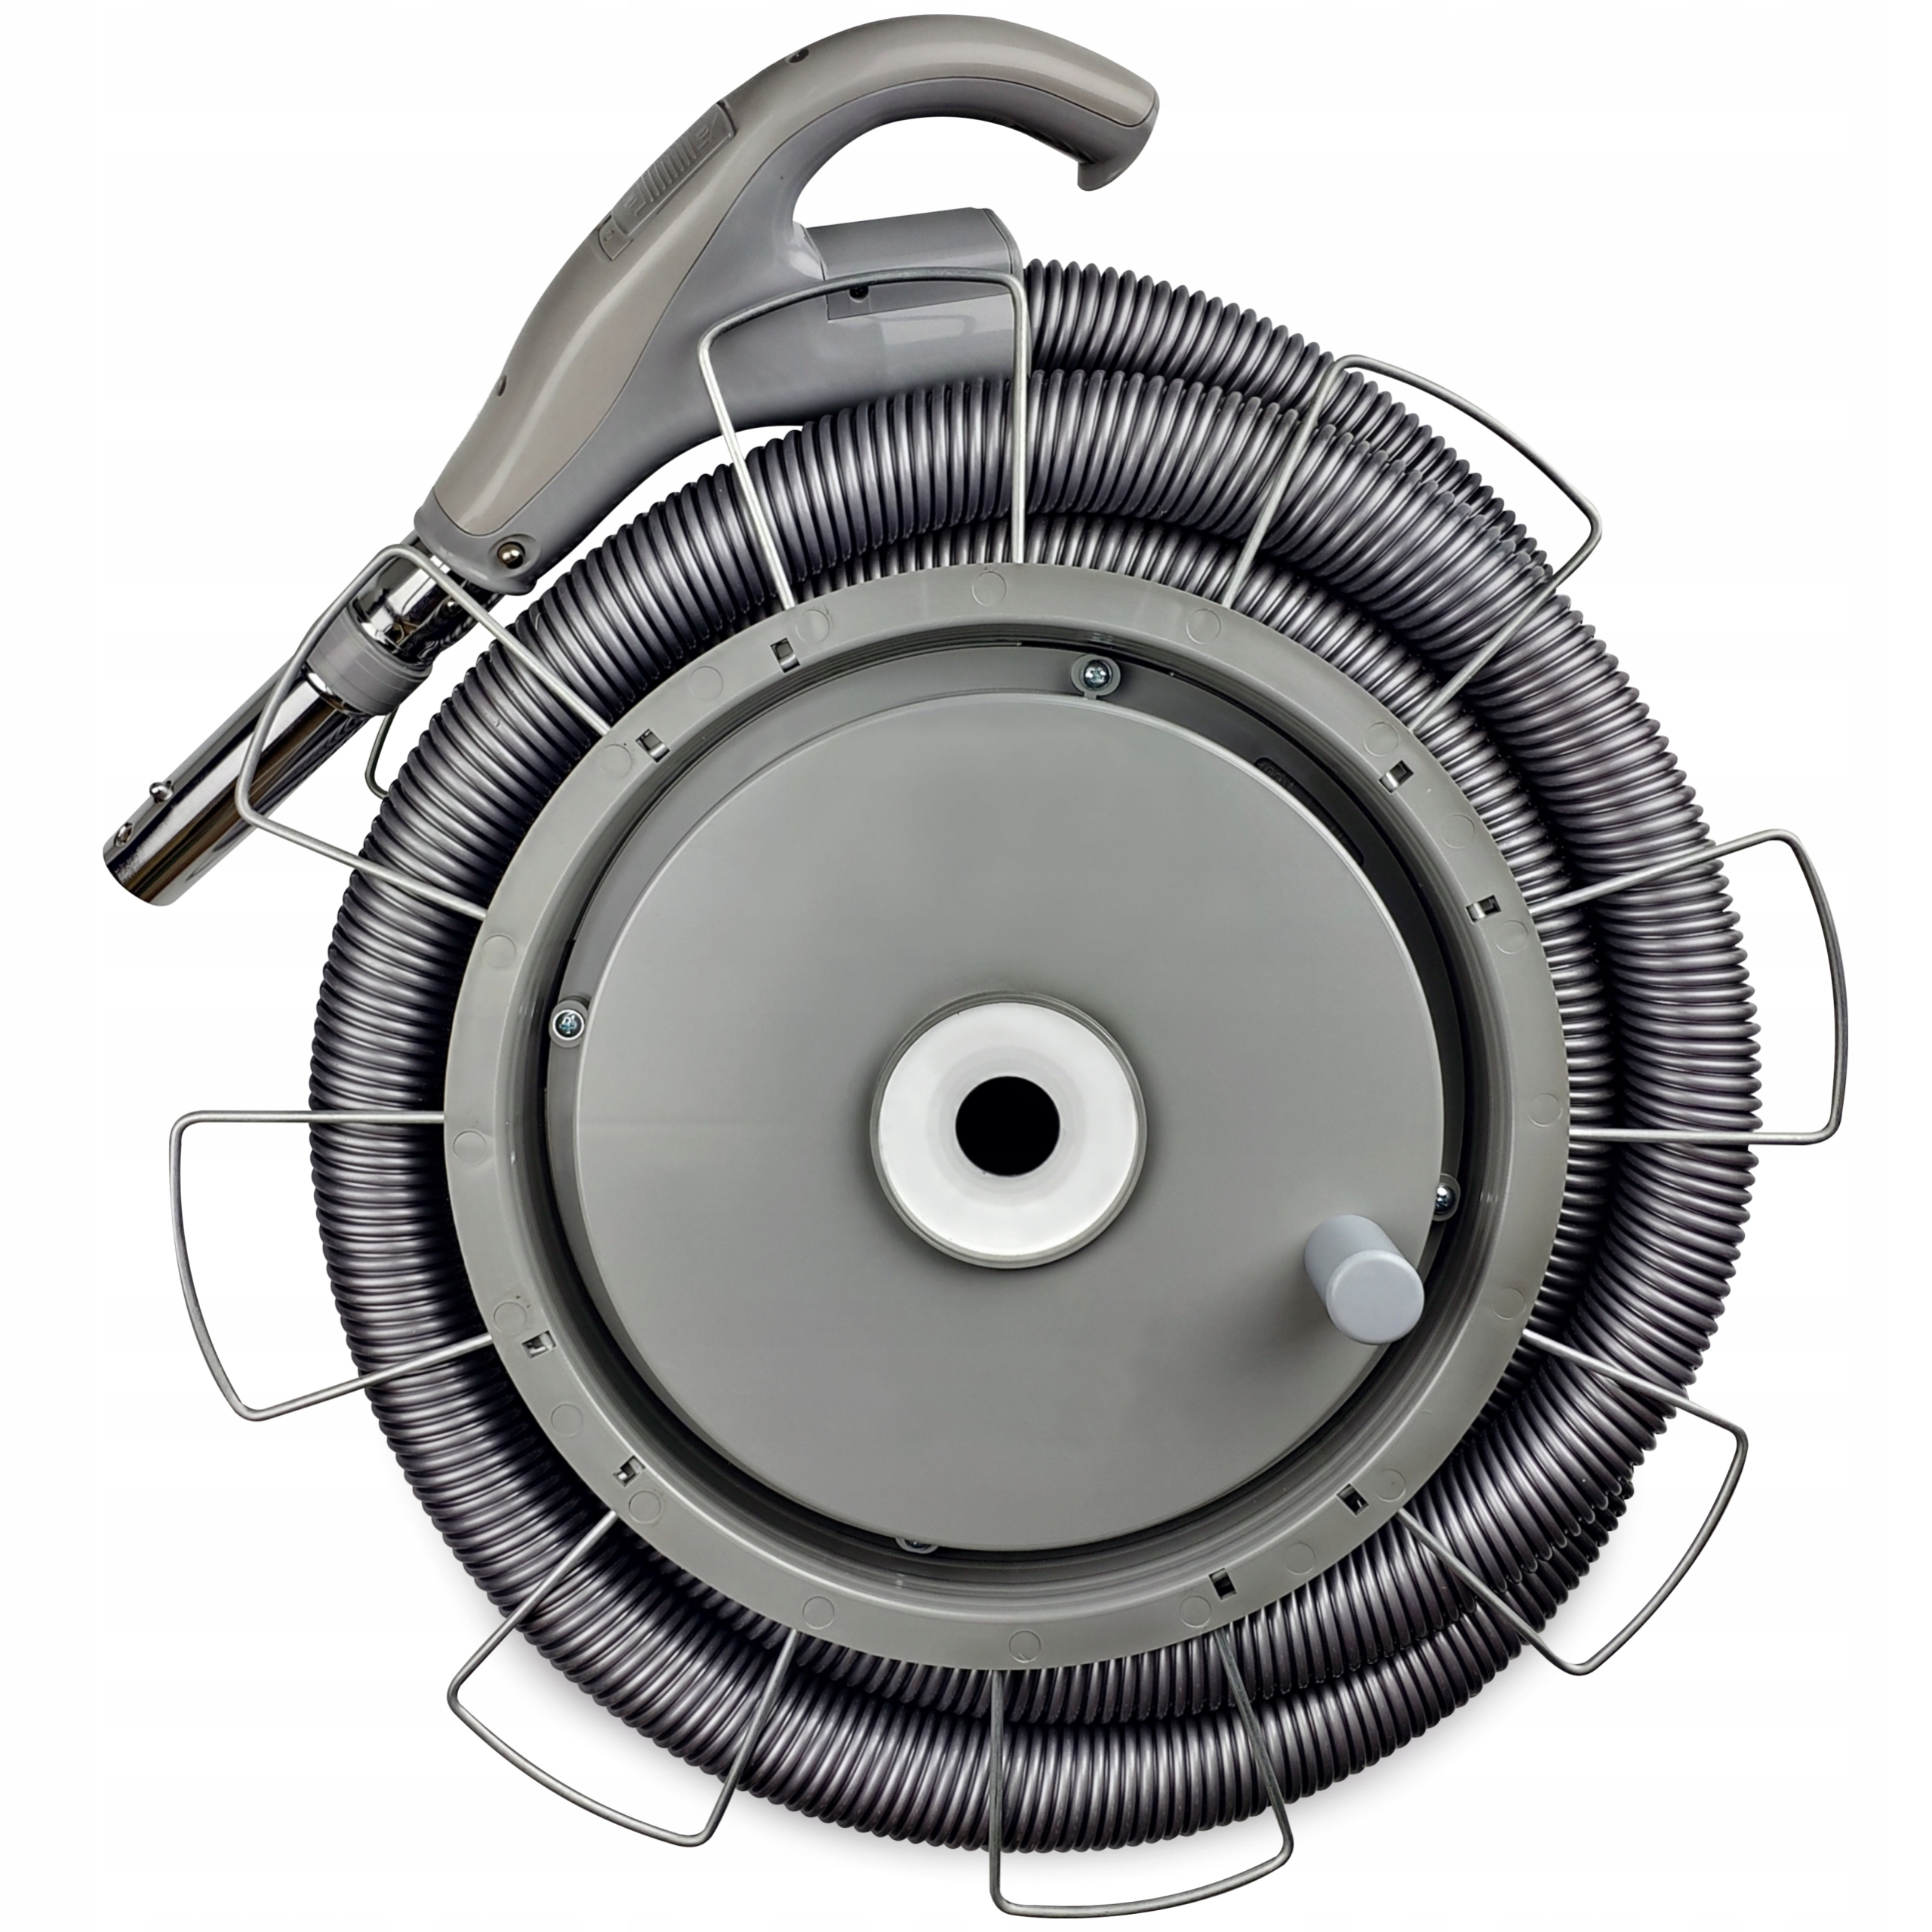 Всасывающий шланг 9м + Retractor VROOM CENTRAL VACUUM CLEANER